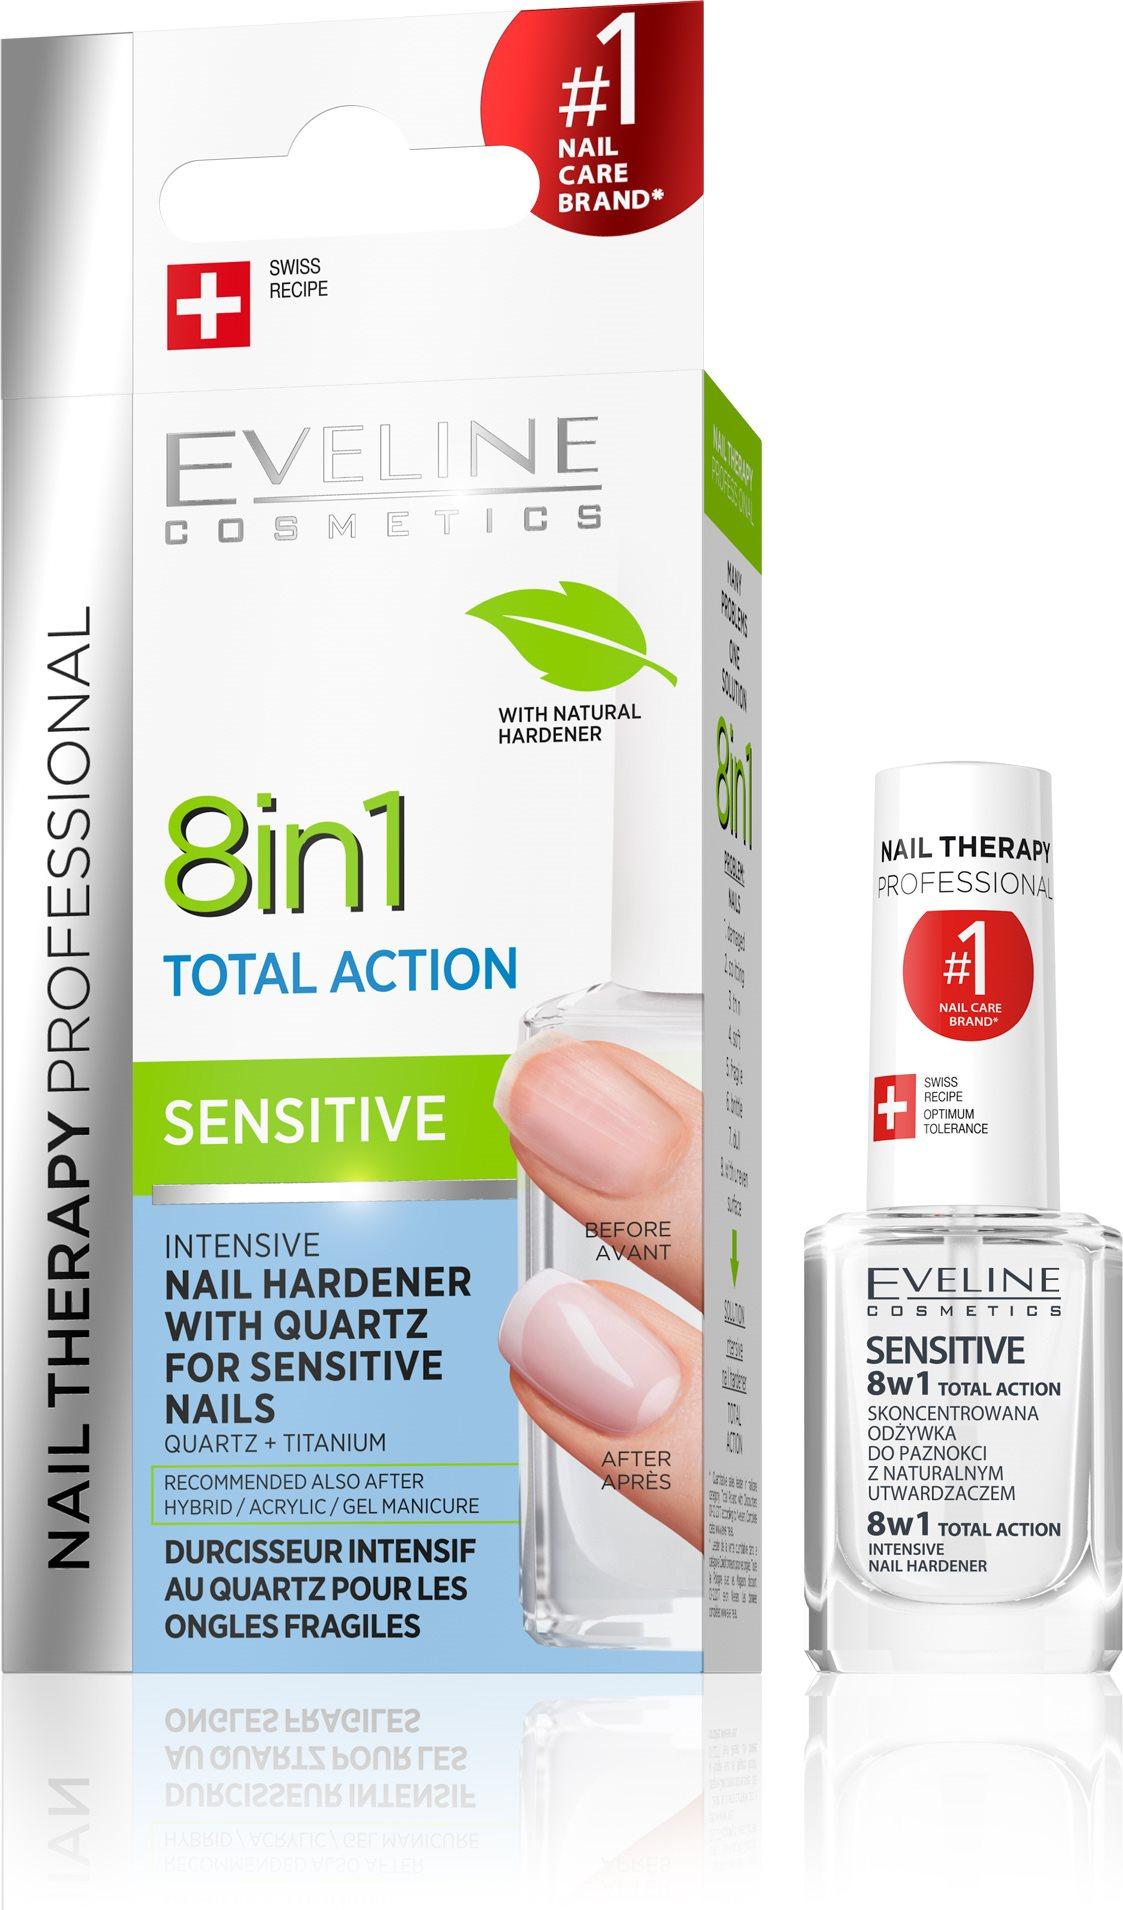 Eveline Cosmetics Nail Spa 8in1 Sensitive 12 ml